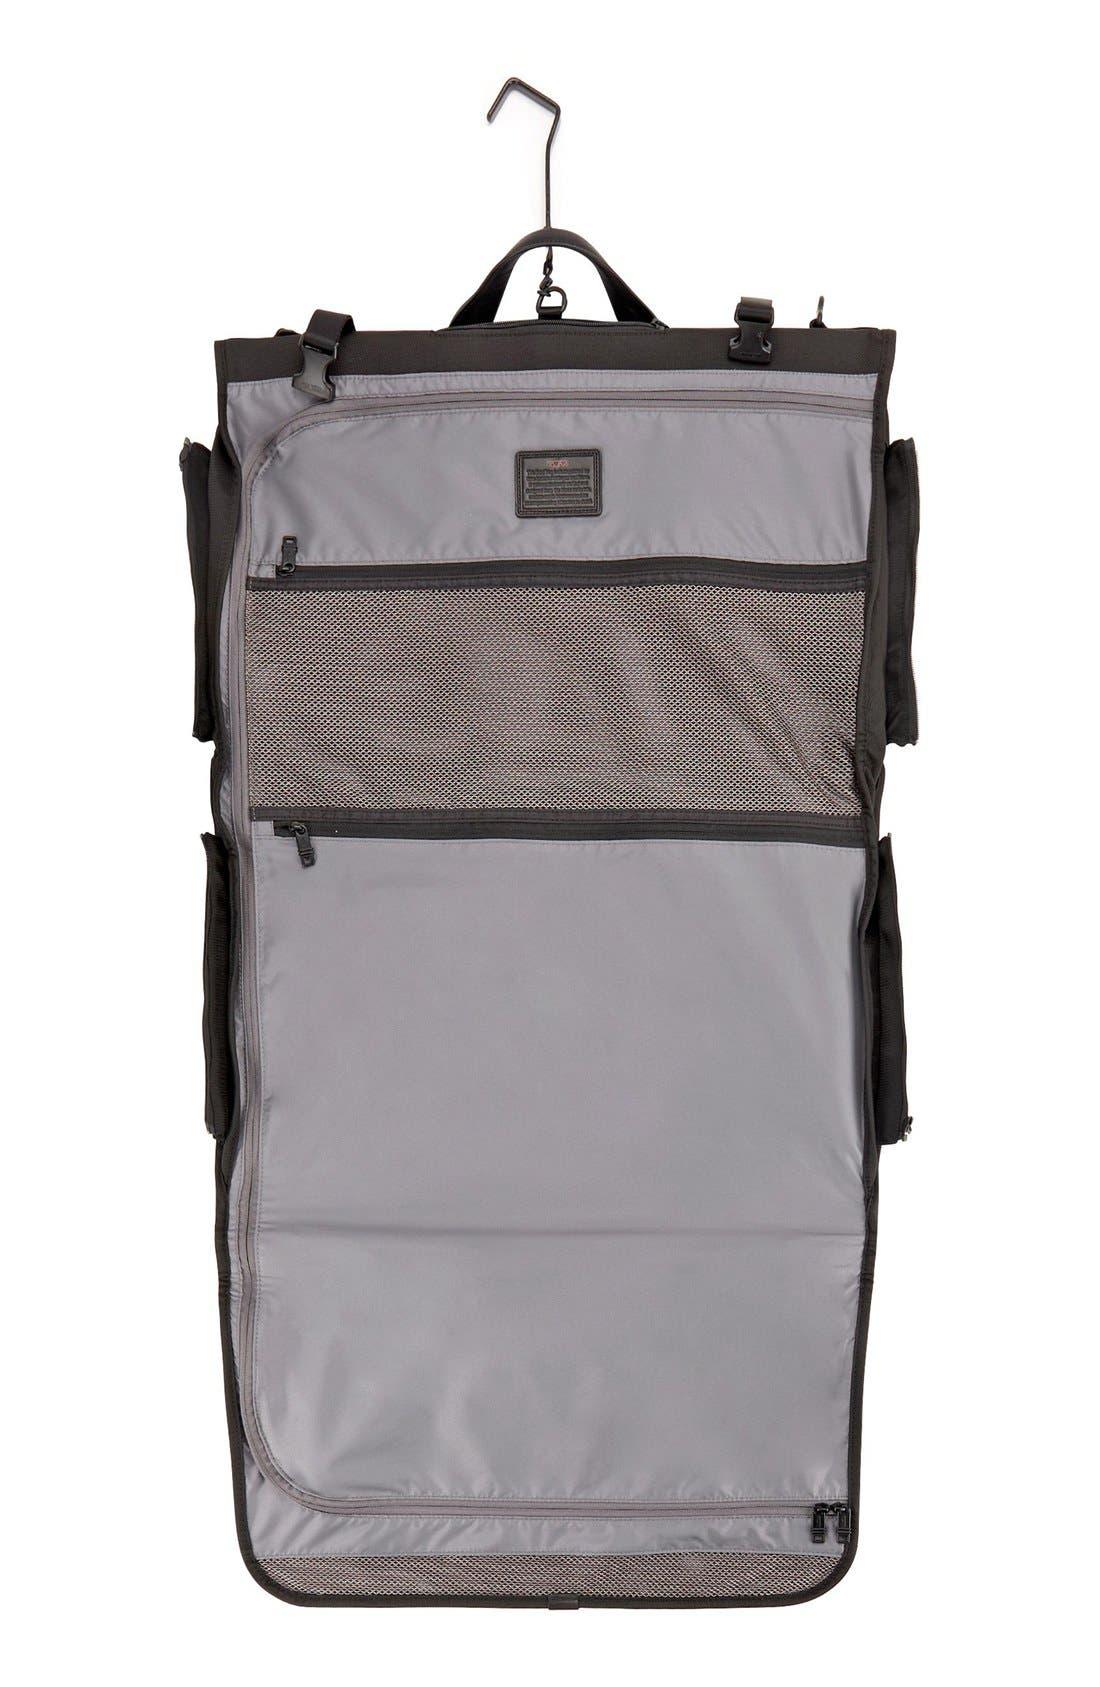 Alpha 2 22-Inch Trifold Carry-On Garment Bag,                             Alternate thumbnail 6, color,                             BLACK